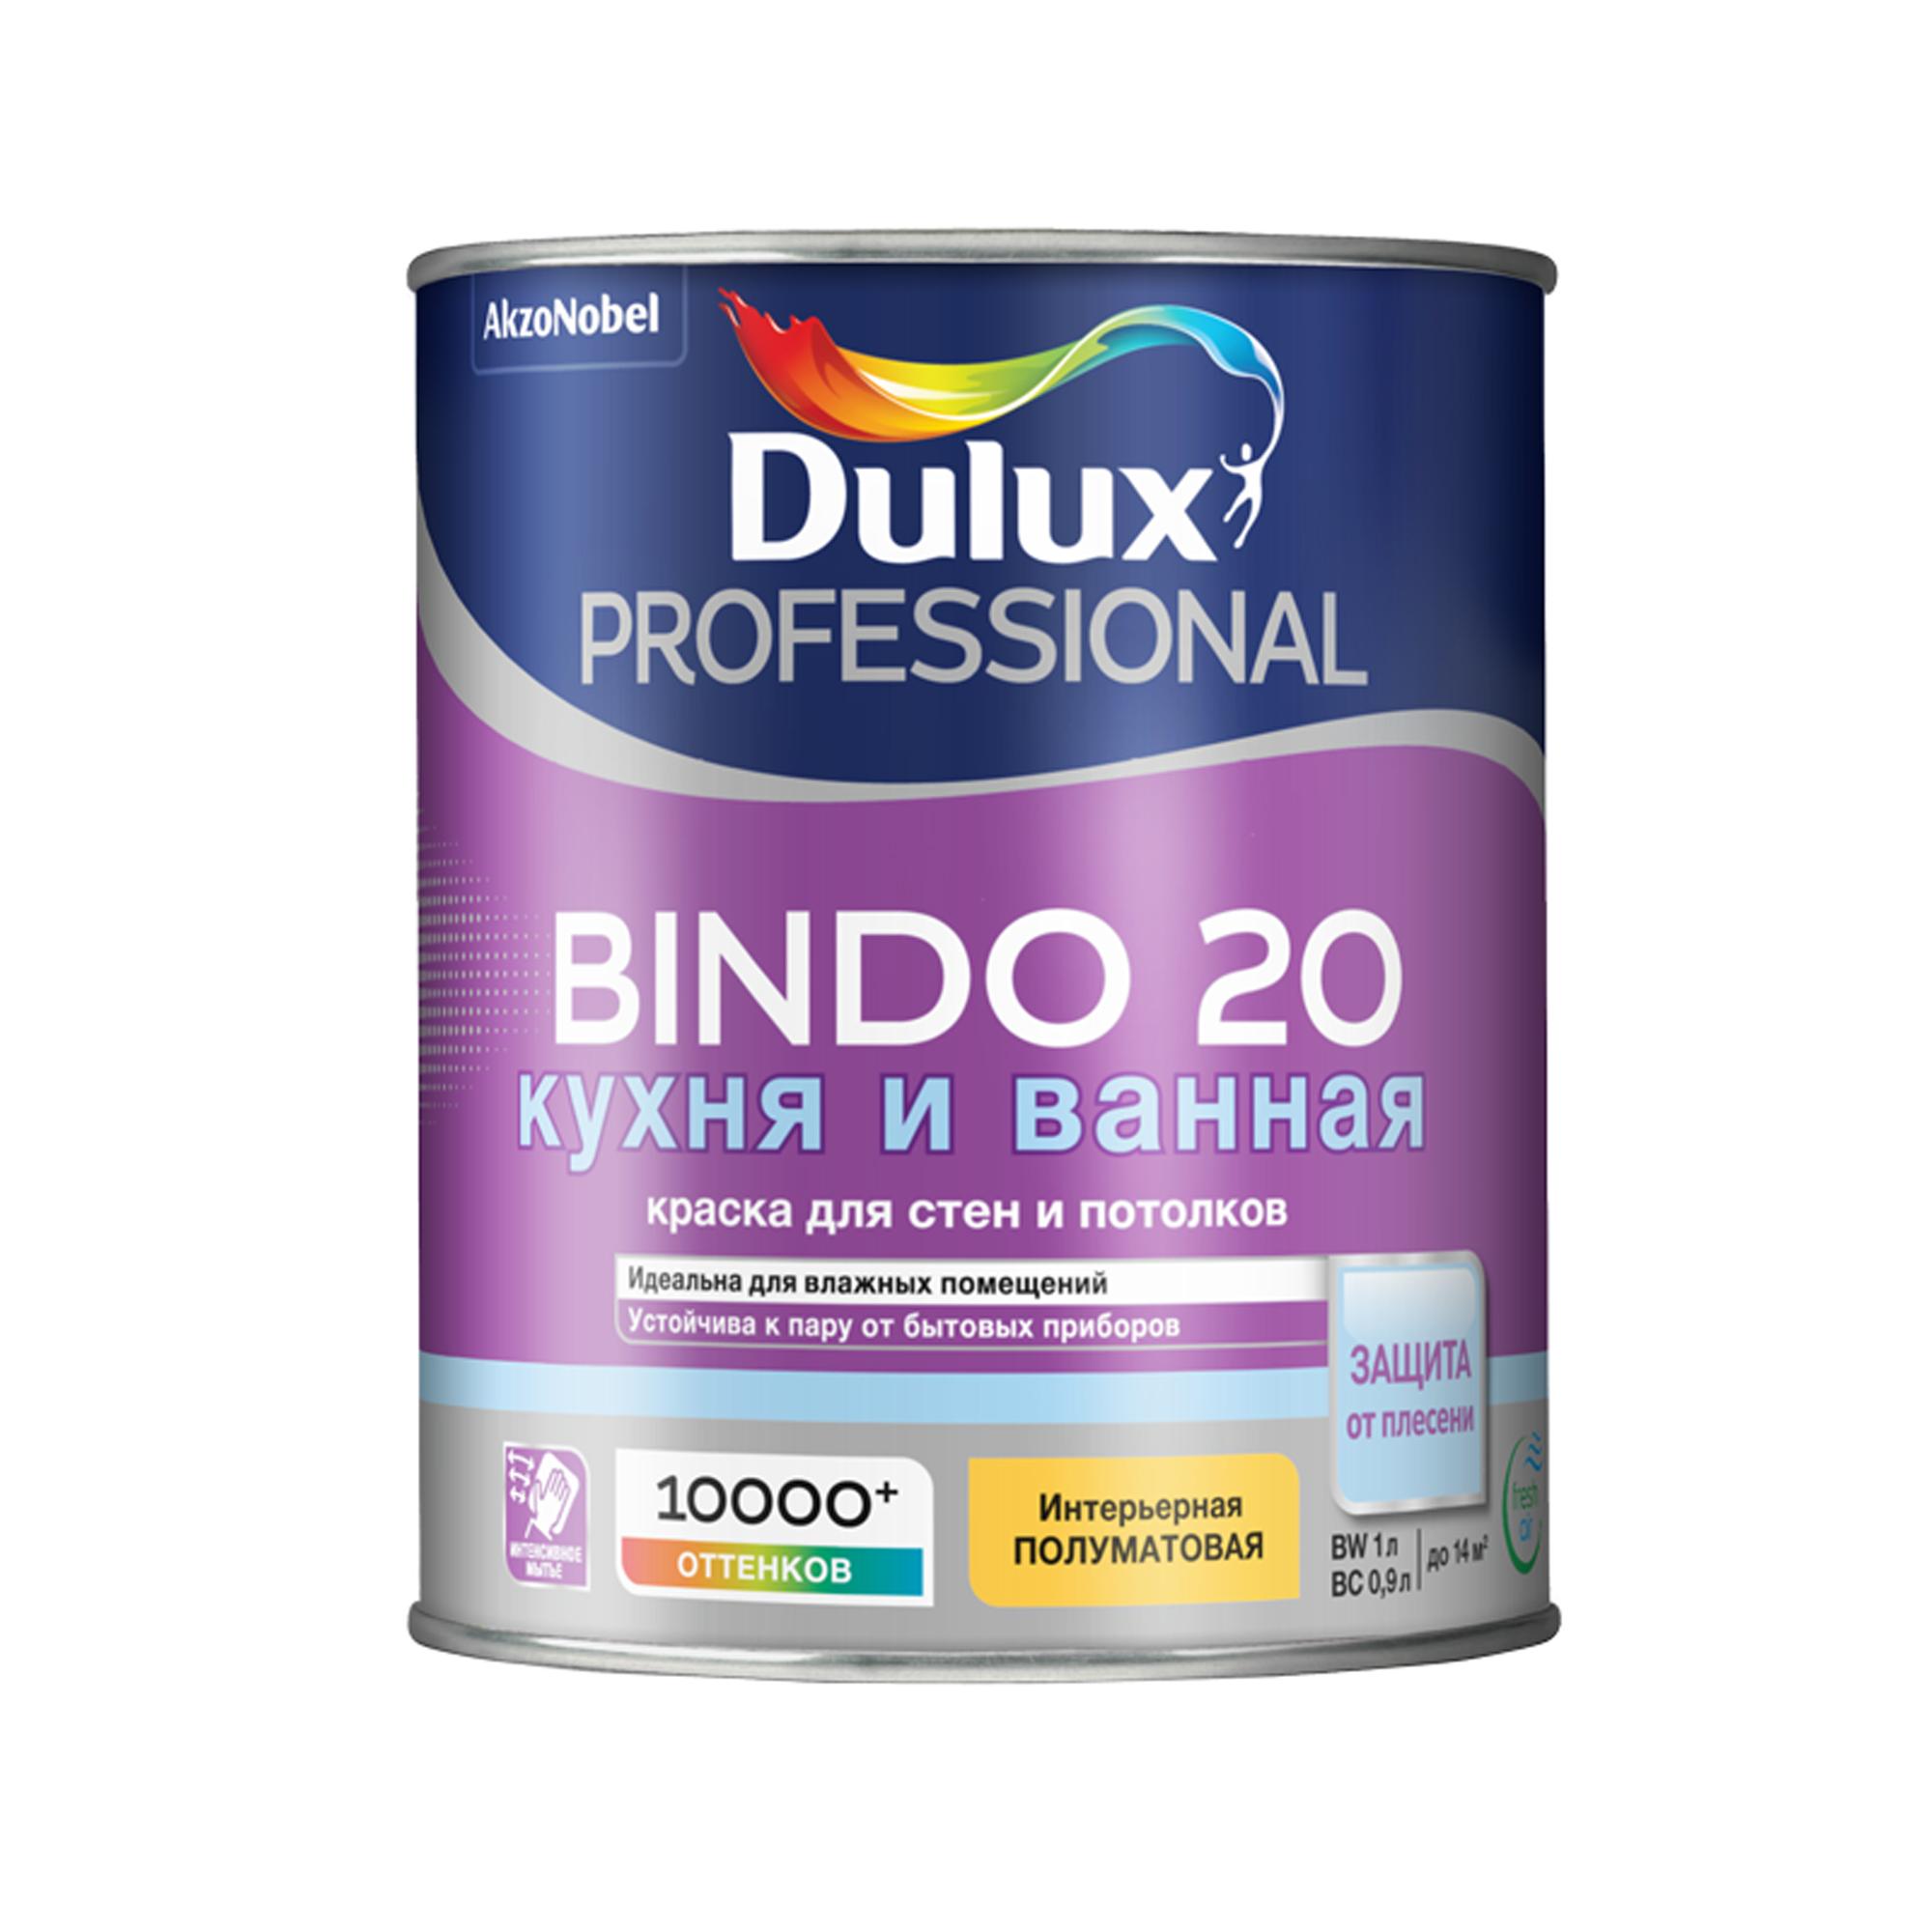 Краска для кухни и ванной латексная Dulux Professional Bindo 20 полуматовая база BW 1 л. фото